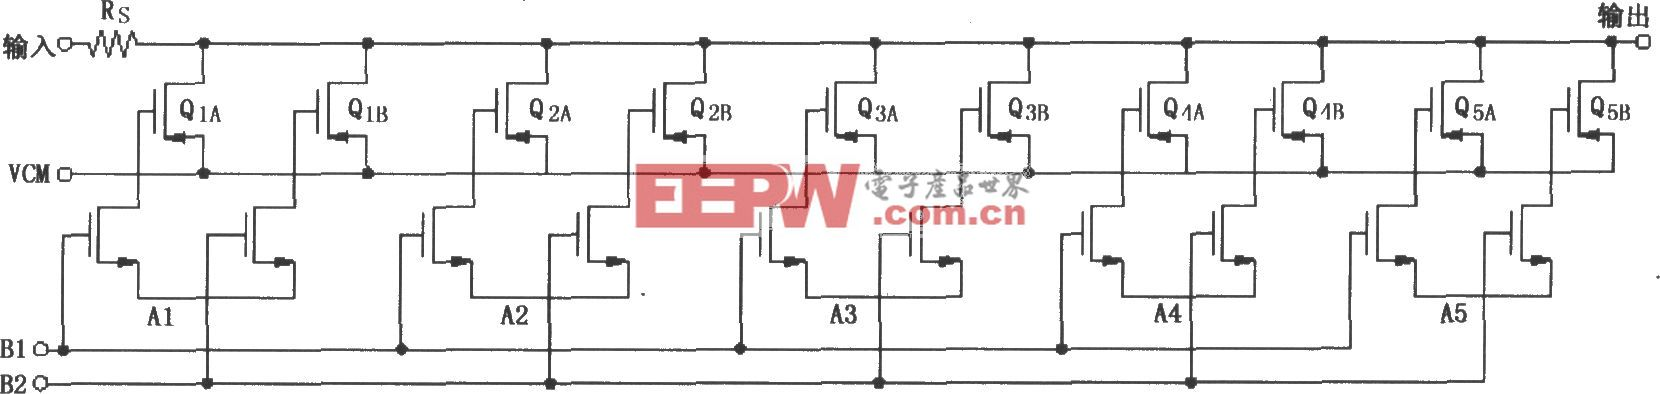 VCA2612/2613/2616可编程衰减器部分电路